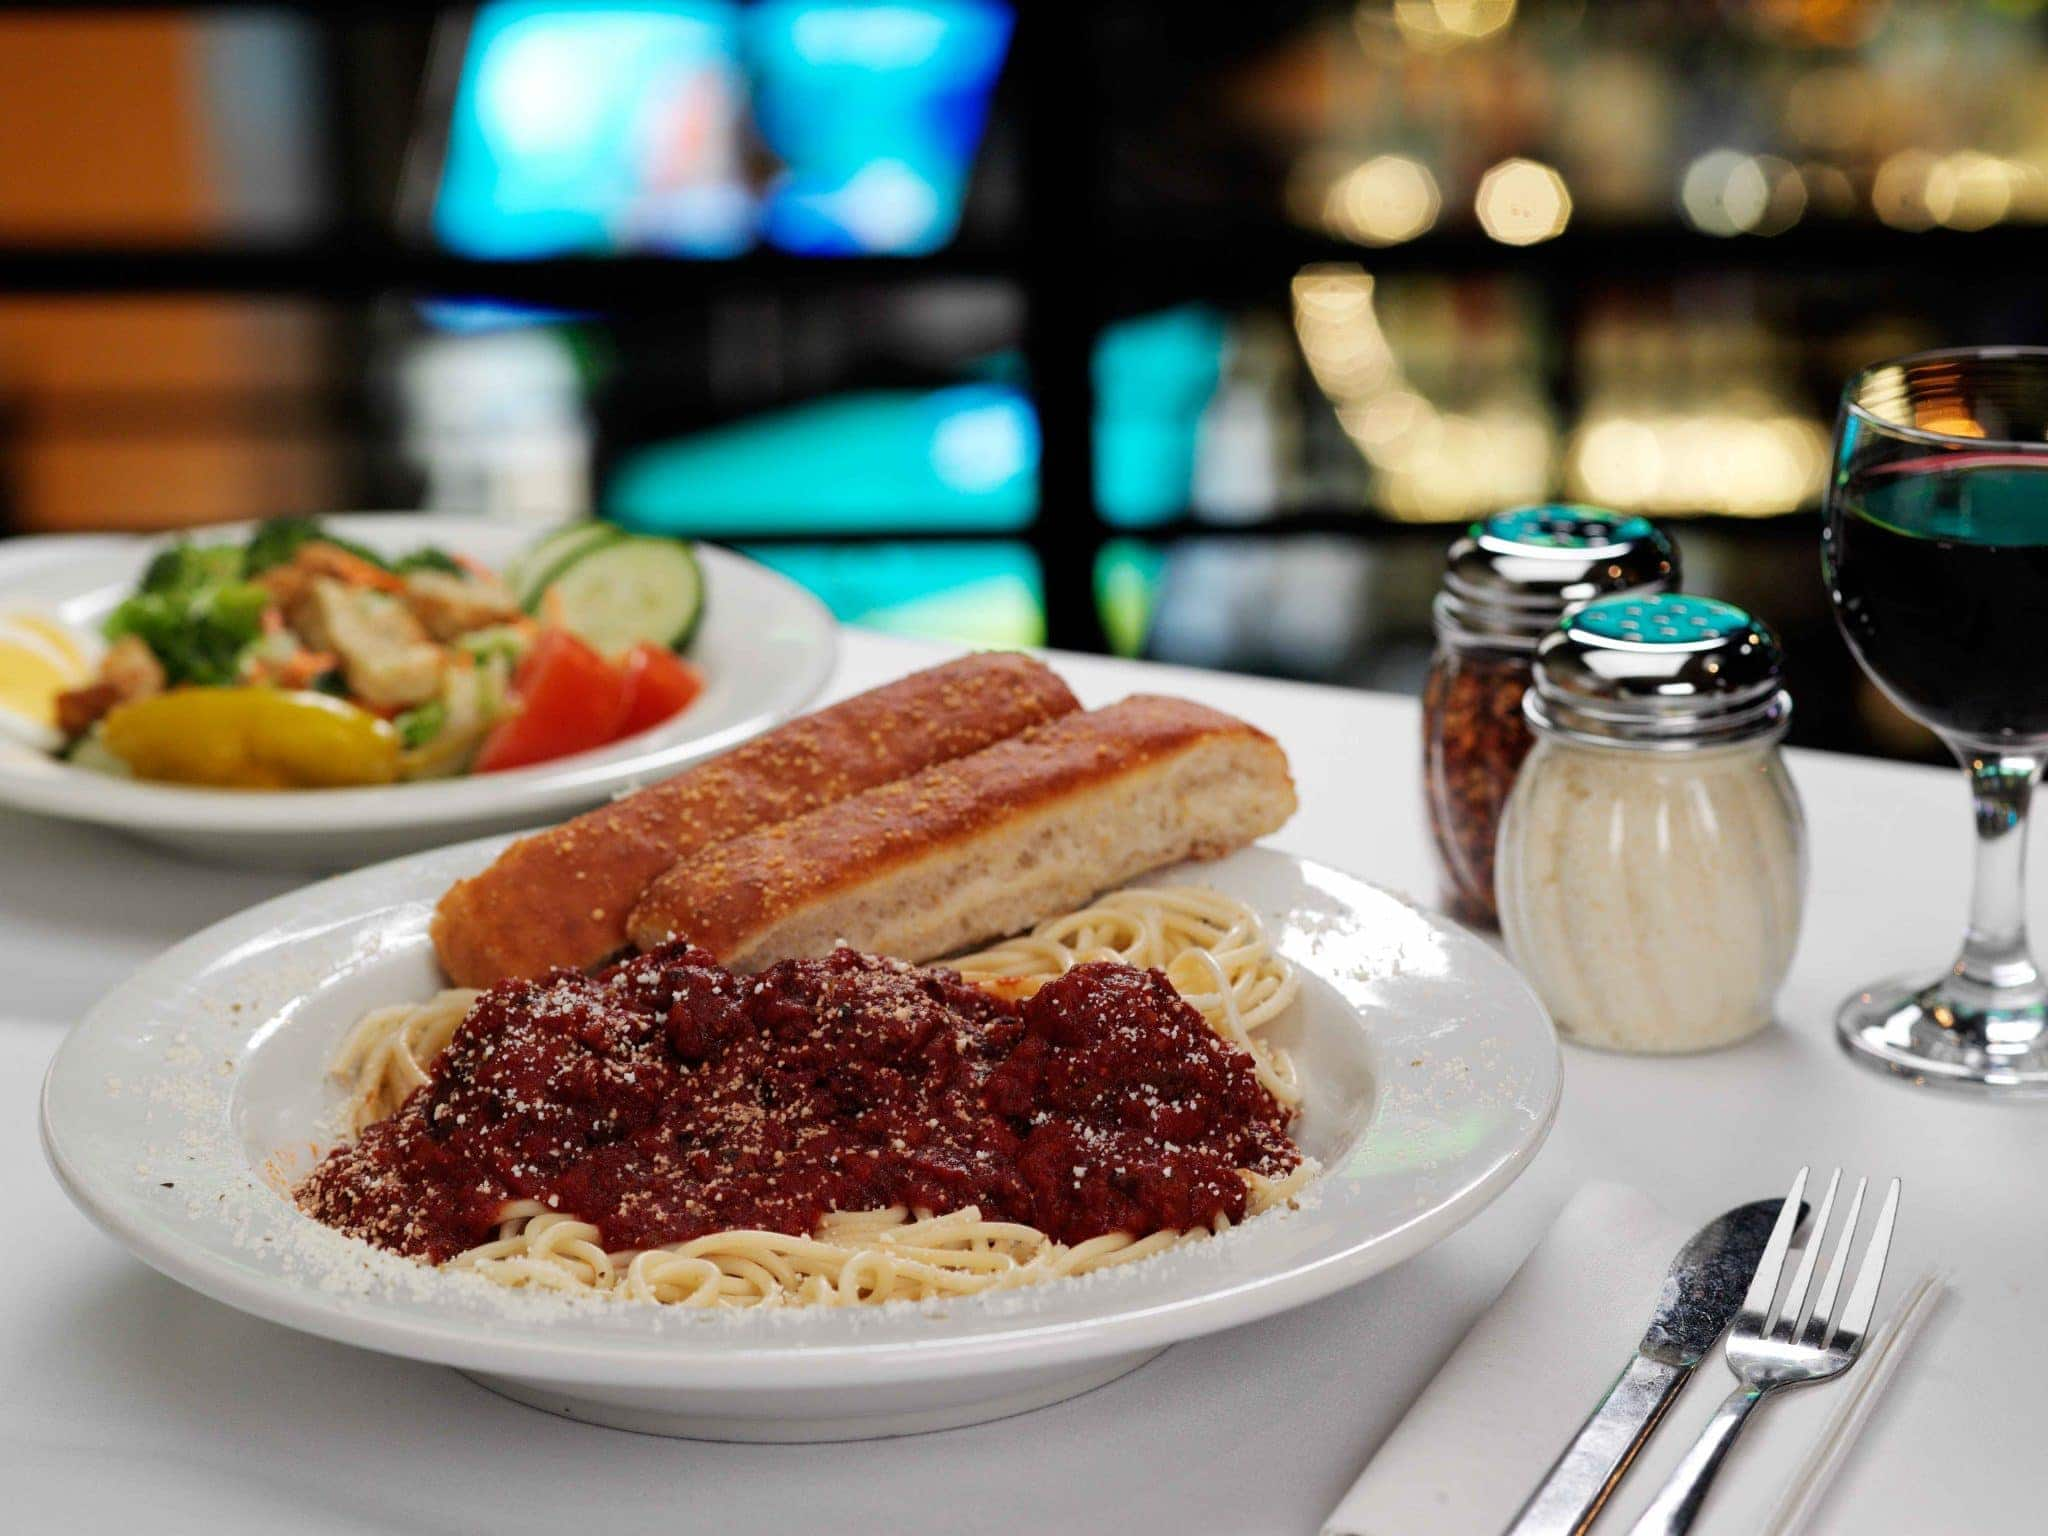 Homemade Italian spaghetti sauce goes well with red wine.